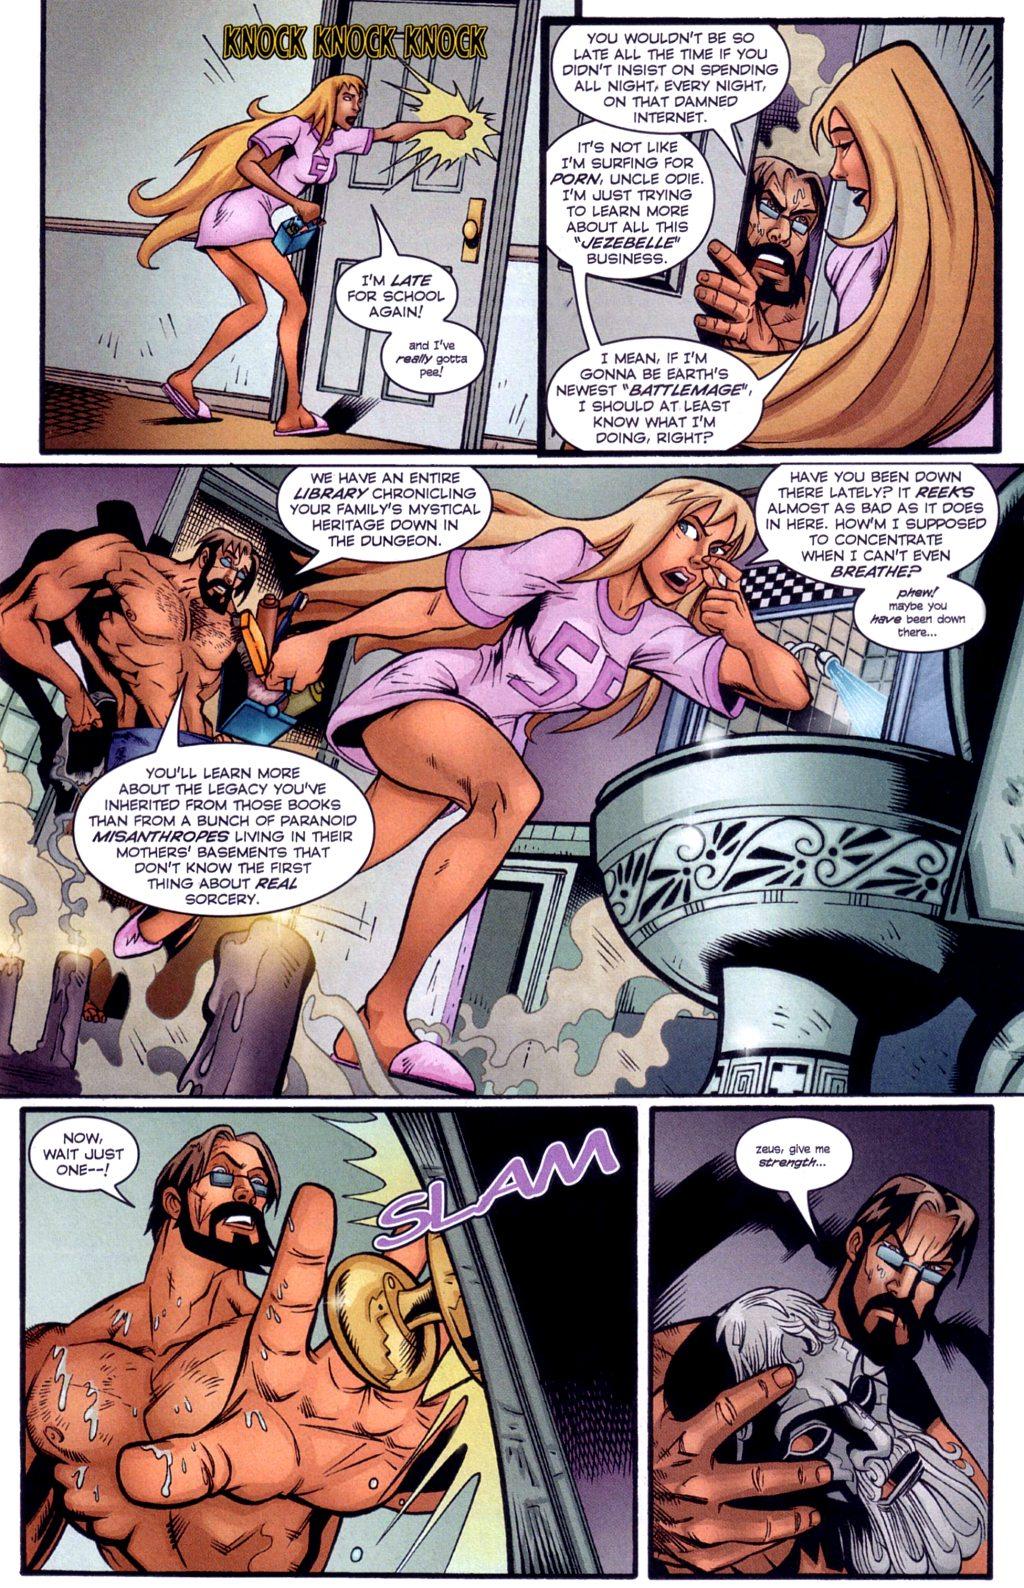 Read online Jezebelle comic -  Issue #4 - 4